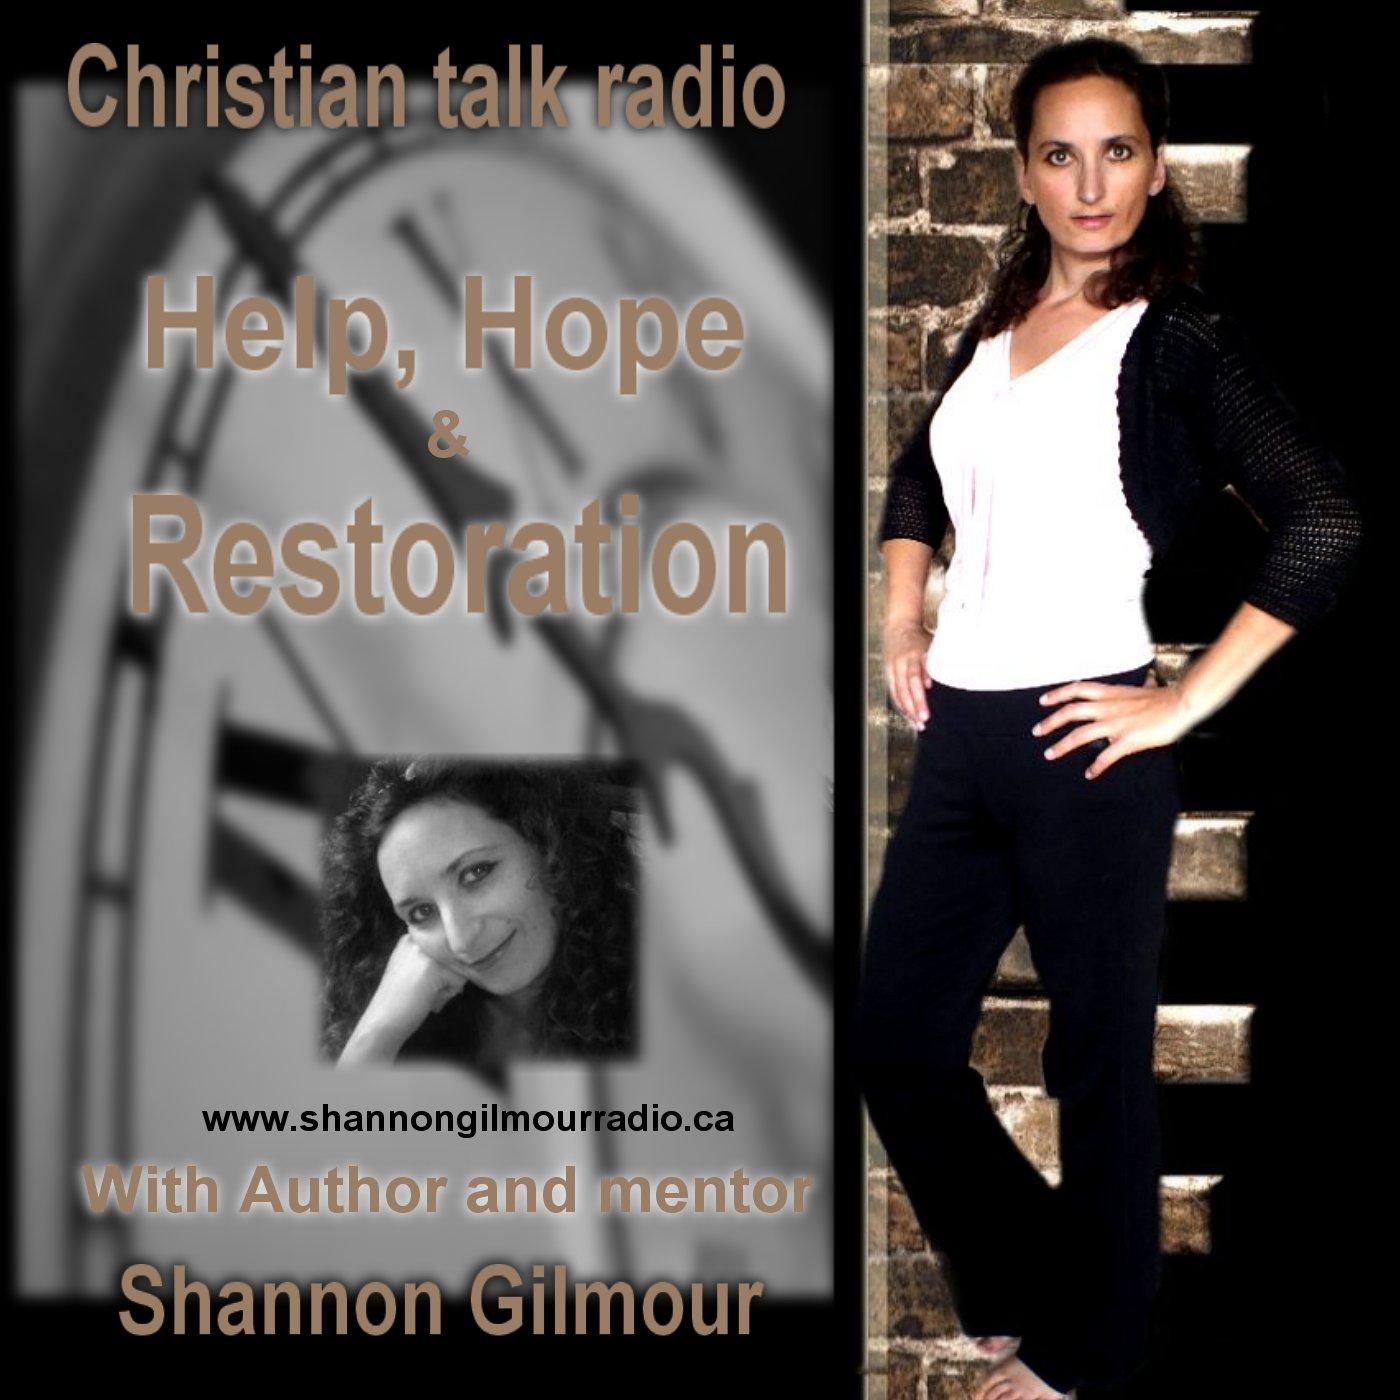 Shannon Gilmour radio